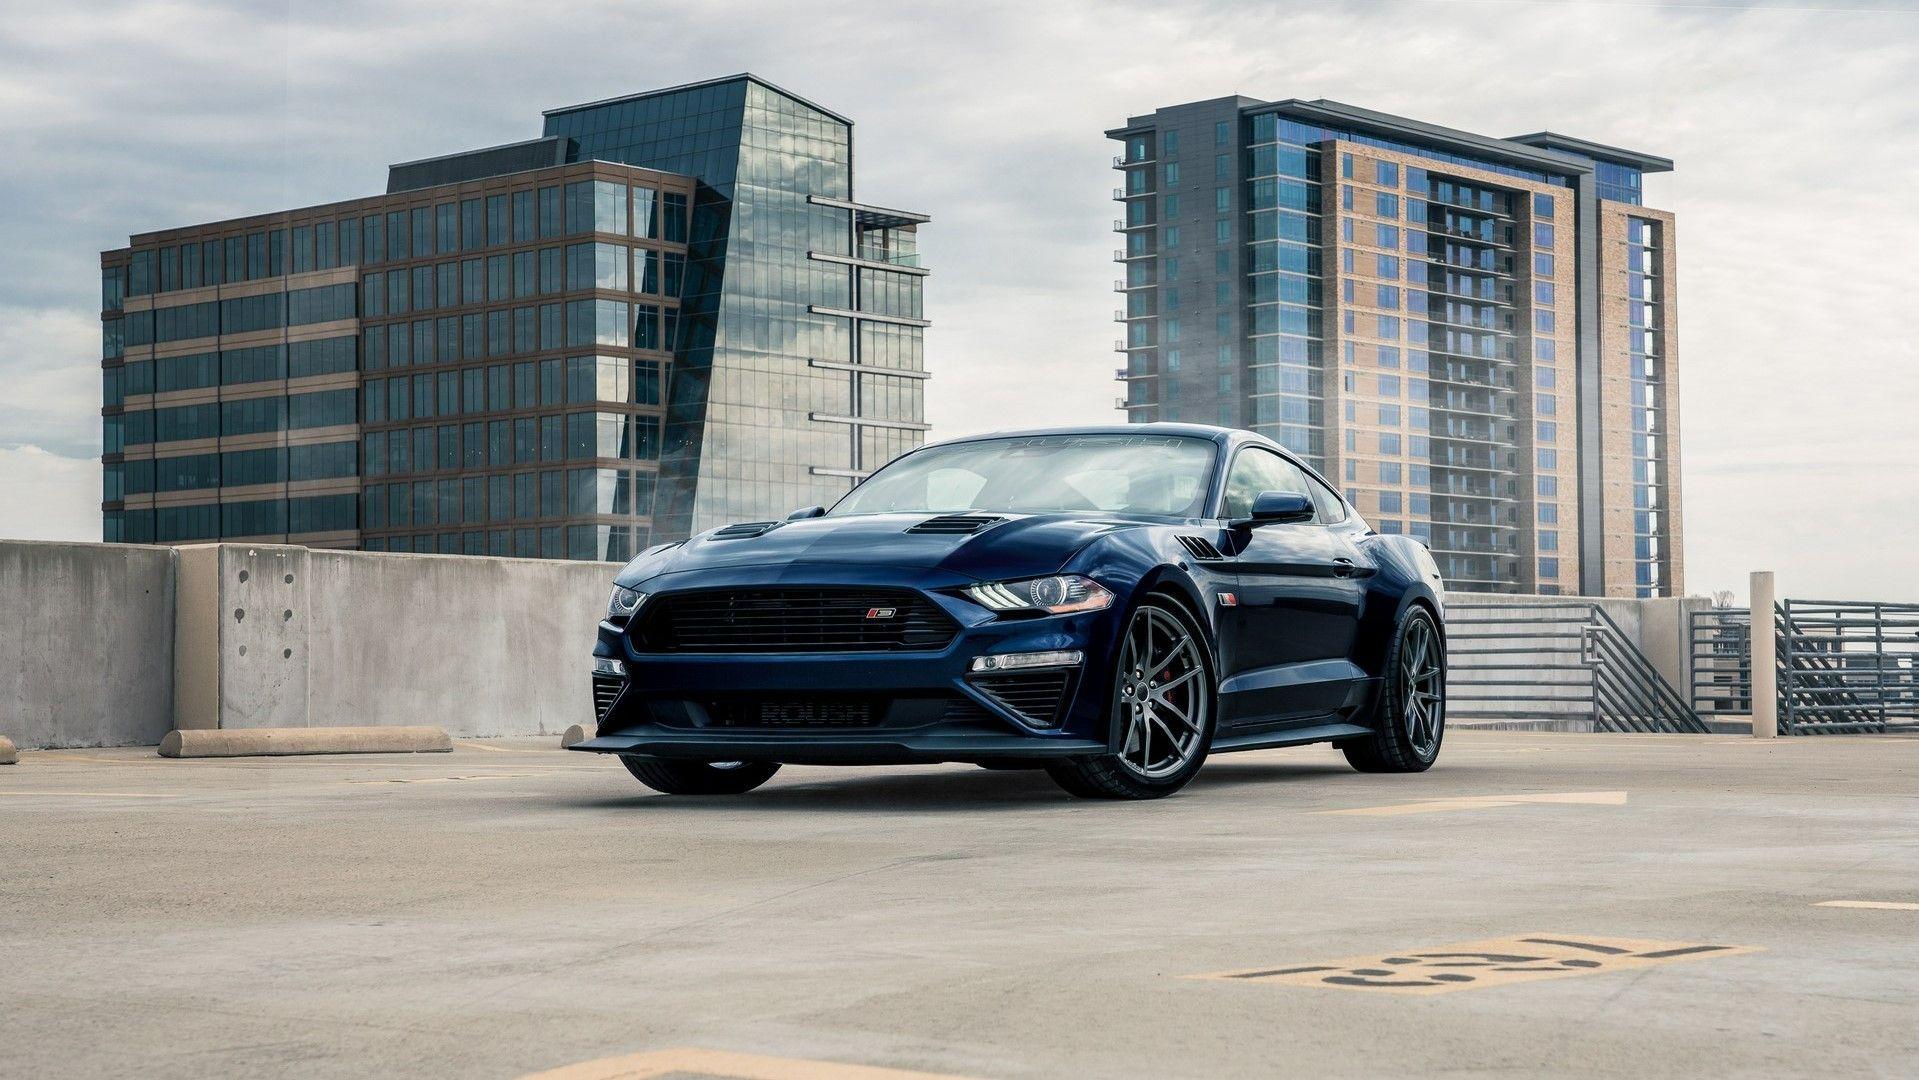 2021 Ford Mustang Roush Stage 3, tu pony car de fin de semana